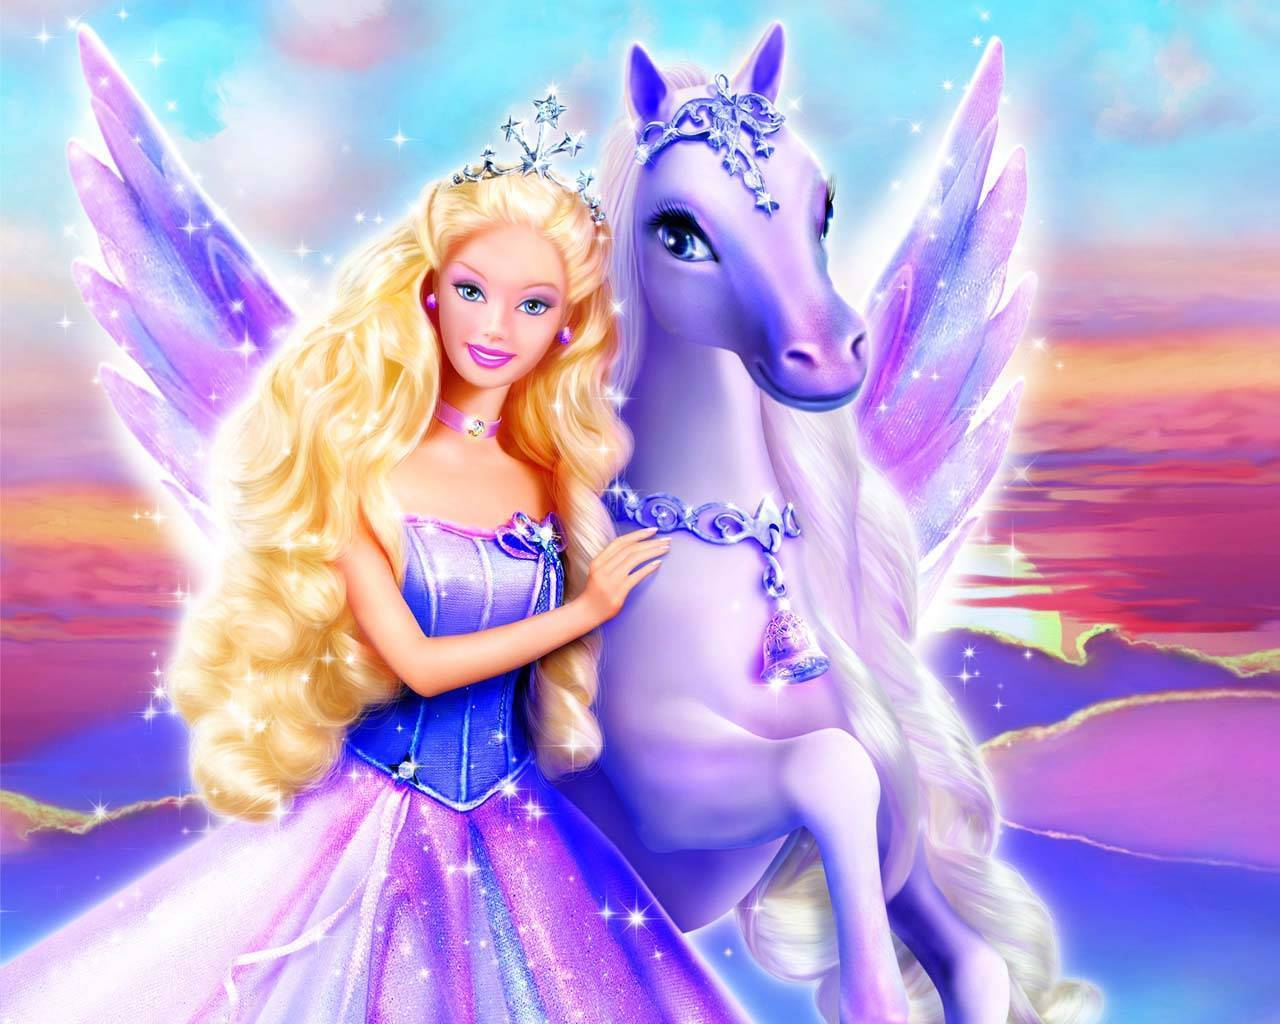 http://3.bp.blogspot.com/-OsItzCk9bHM/UAxuuqozDDI/AAAAAAAAAMw/Y8RnmeDQNS4/s1600/Wallpapers-da-Barbie-7.jpg